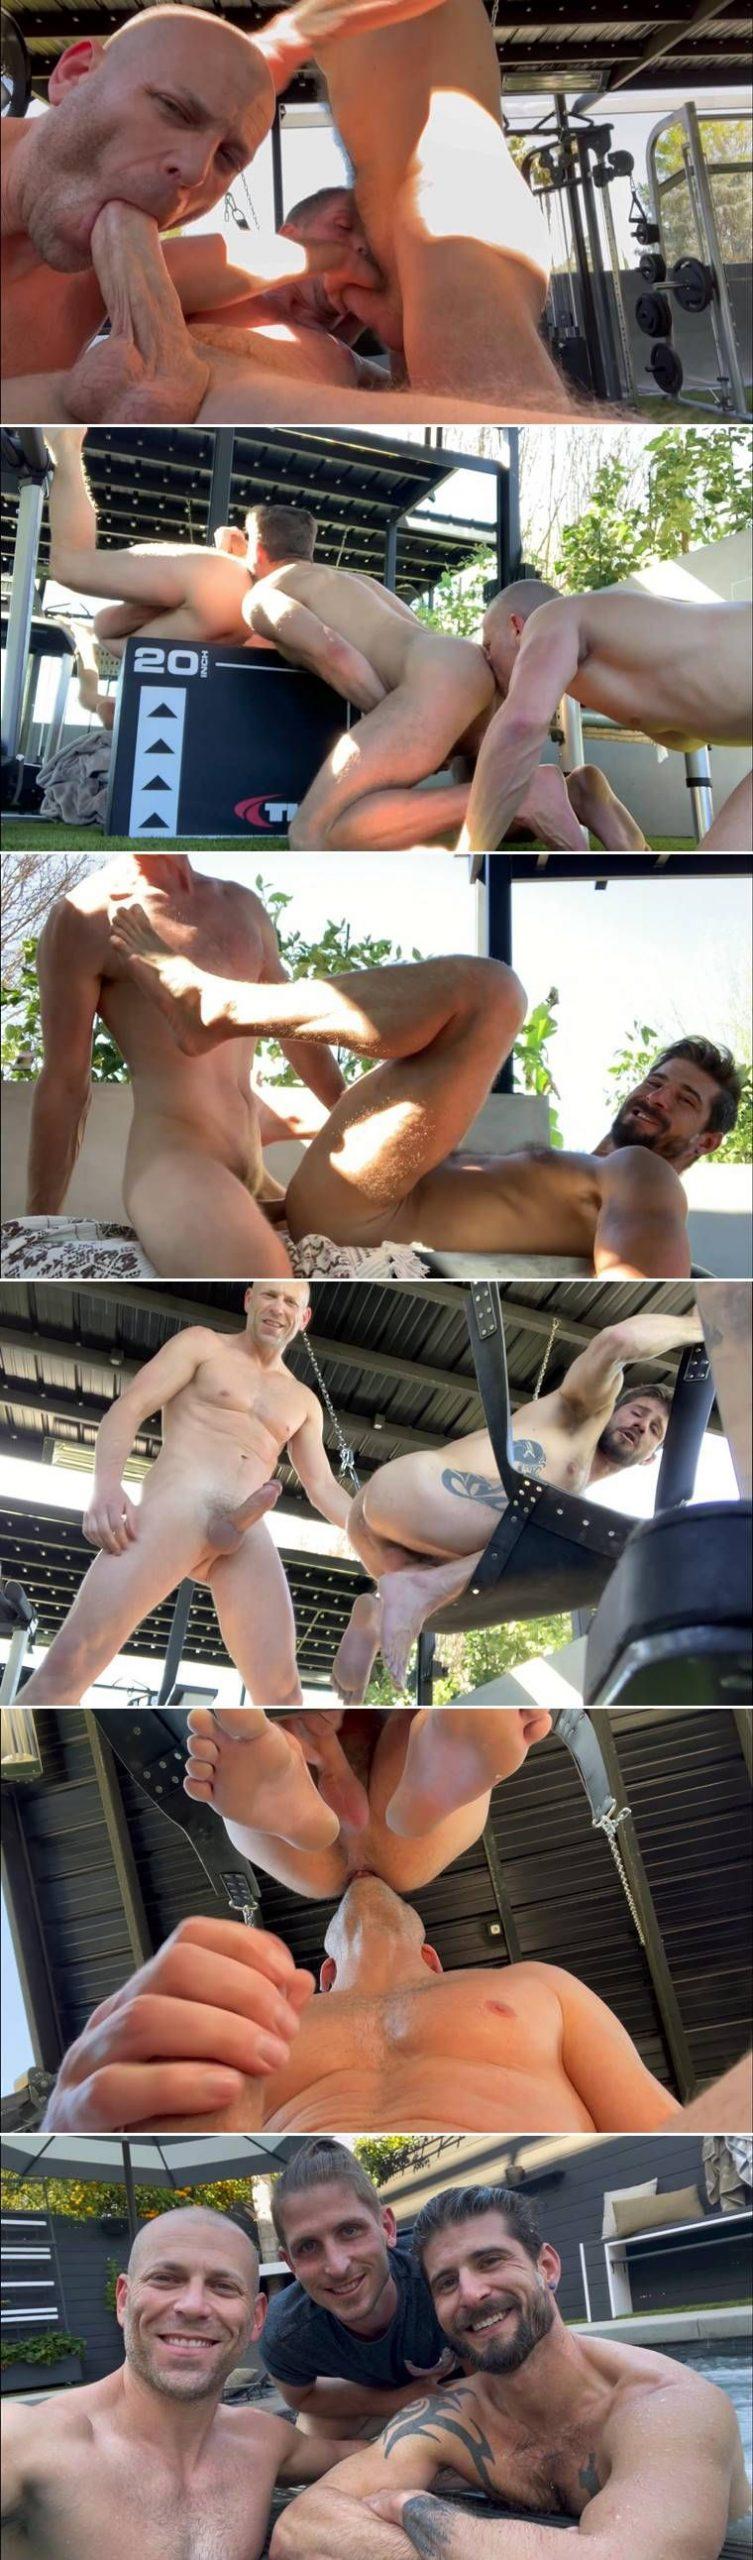 The Big C Men: Cory & Jared Breed Sean Maygers 1